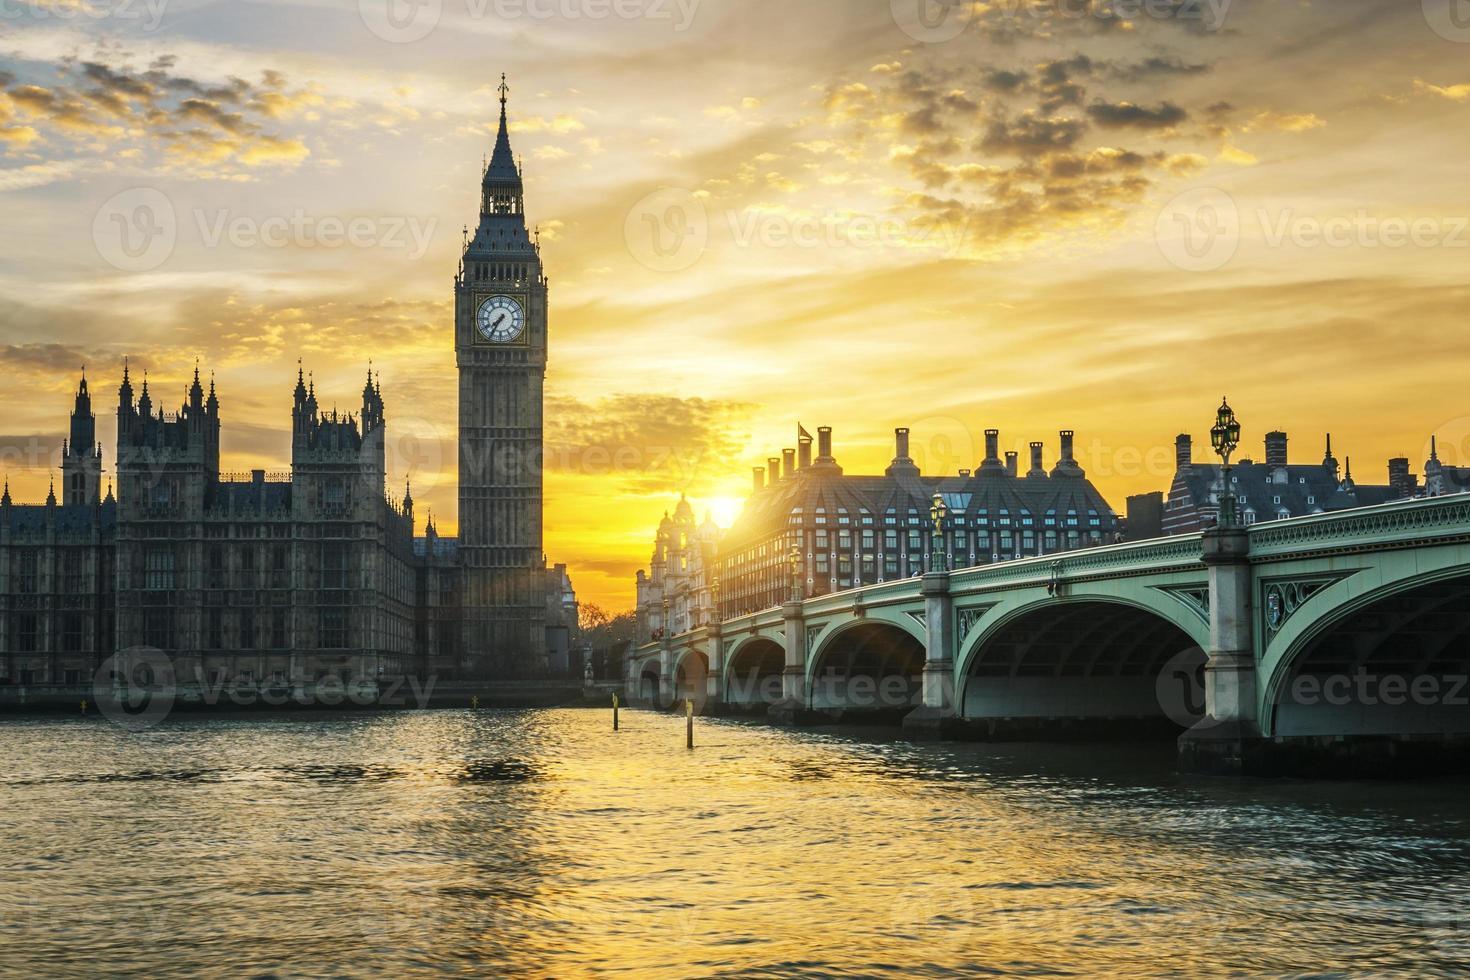 famosa torre del reloj big ben en londres al atardecer foto